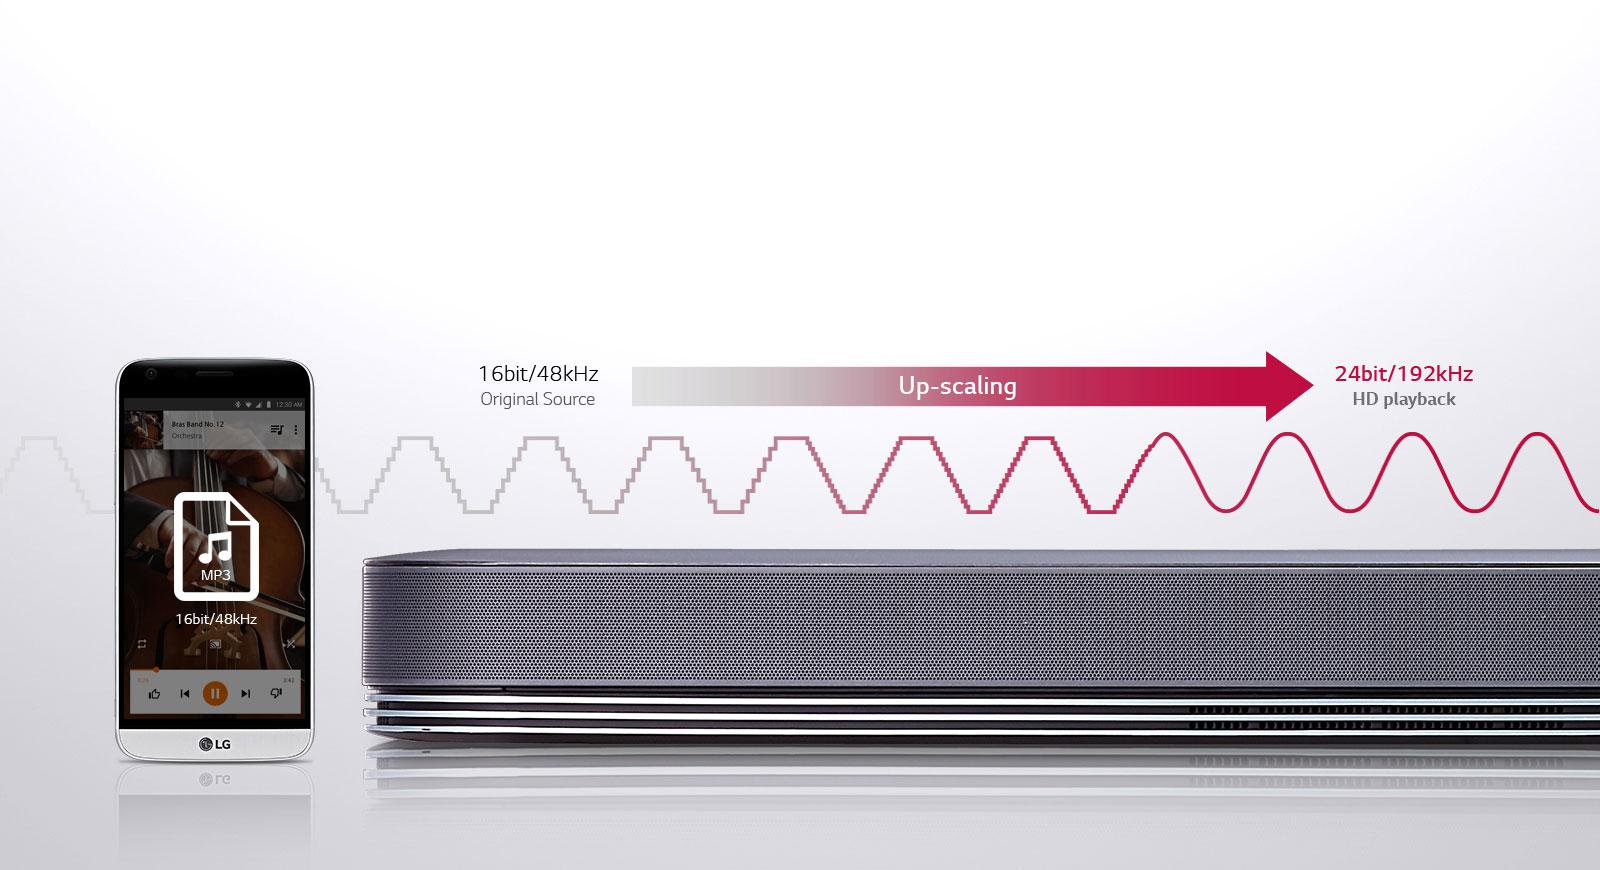 SJ9_High-Resolution-Audio-Upconverting_23102017_D